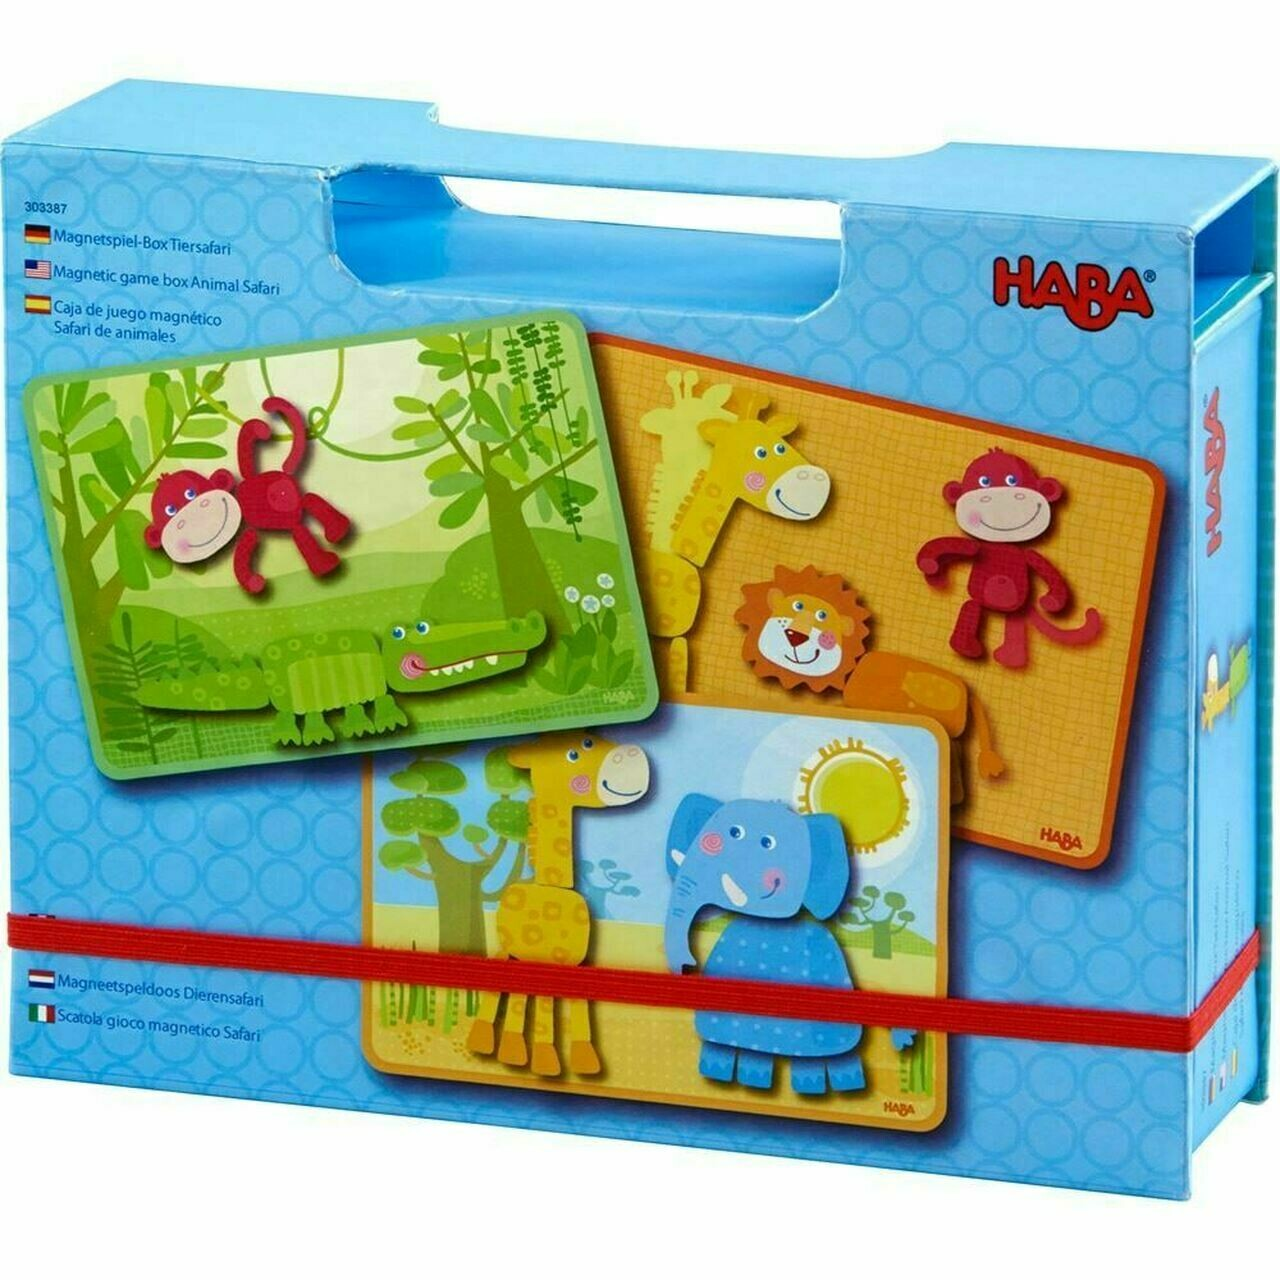 Animal Safari Magnetic Game Box